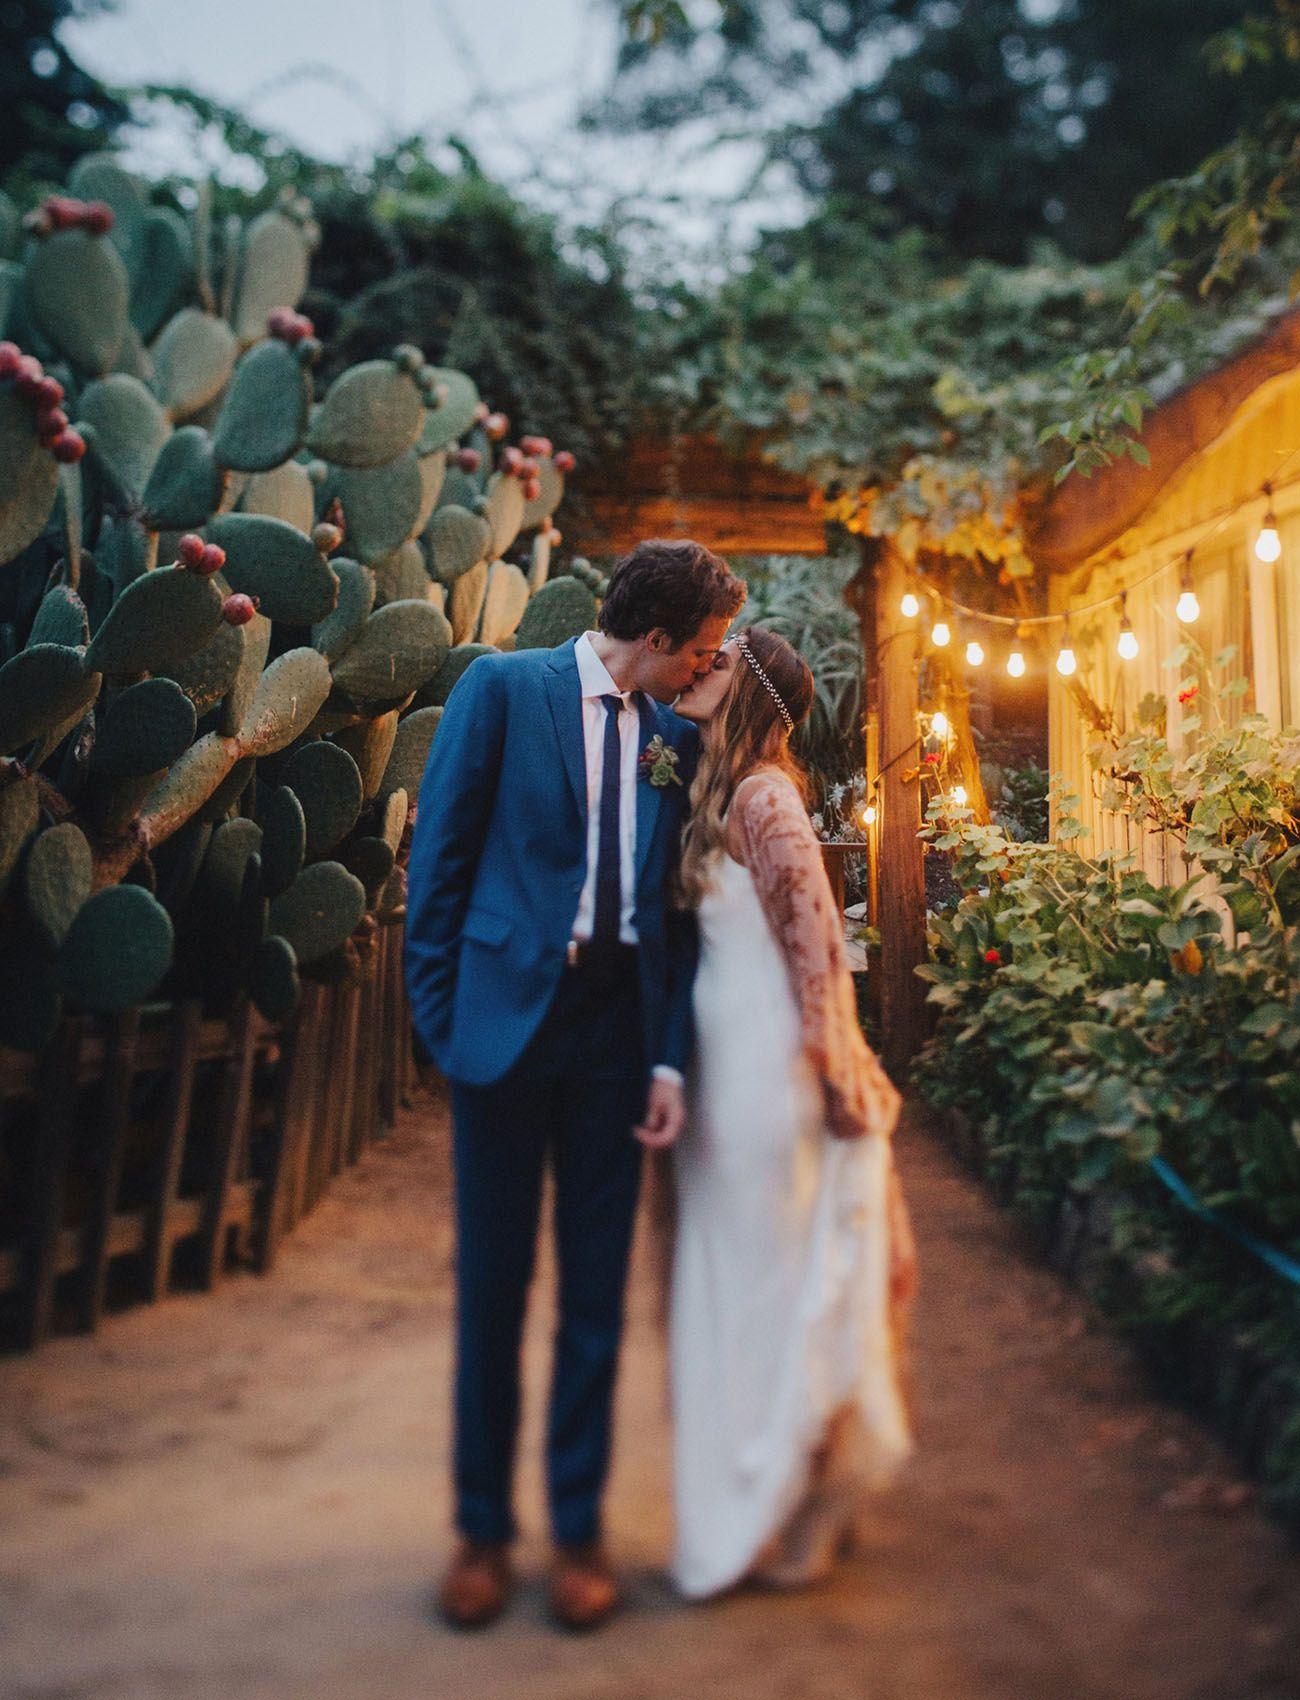 seaside big sur wedding katie david the o jays kimonos and big sur wedding for the boho bride that loves california twinkling lights and